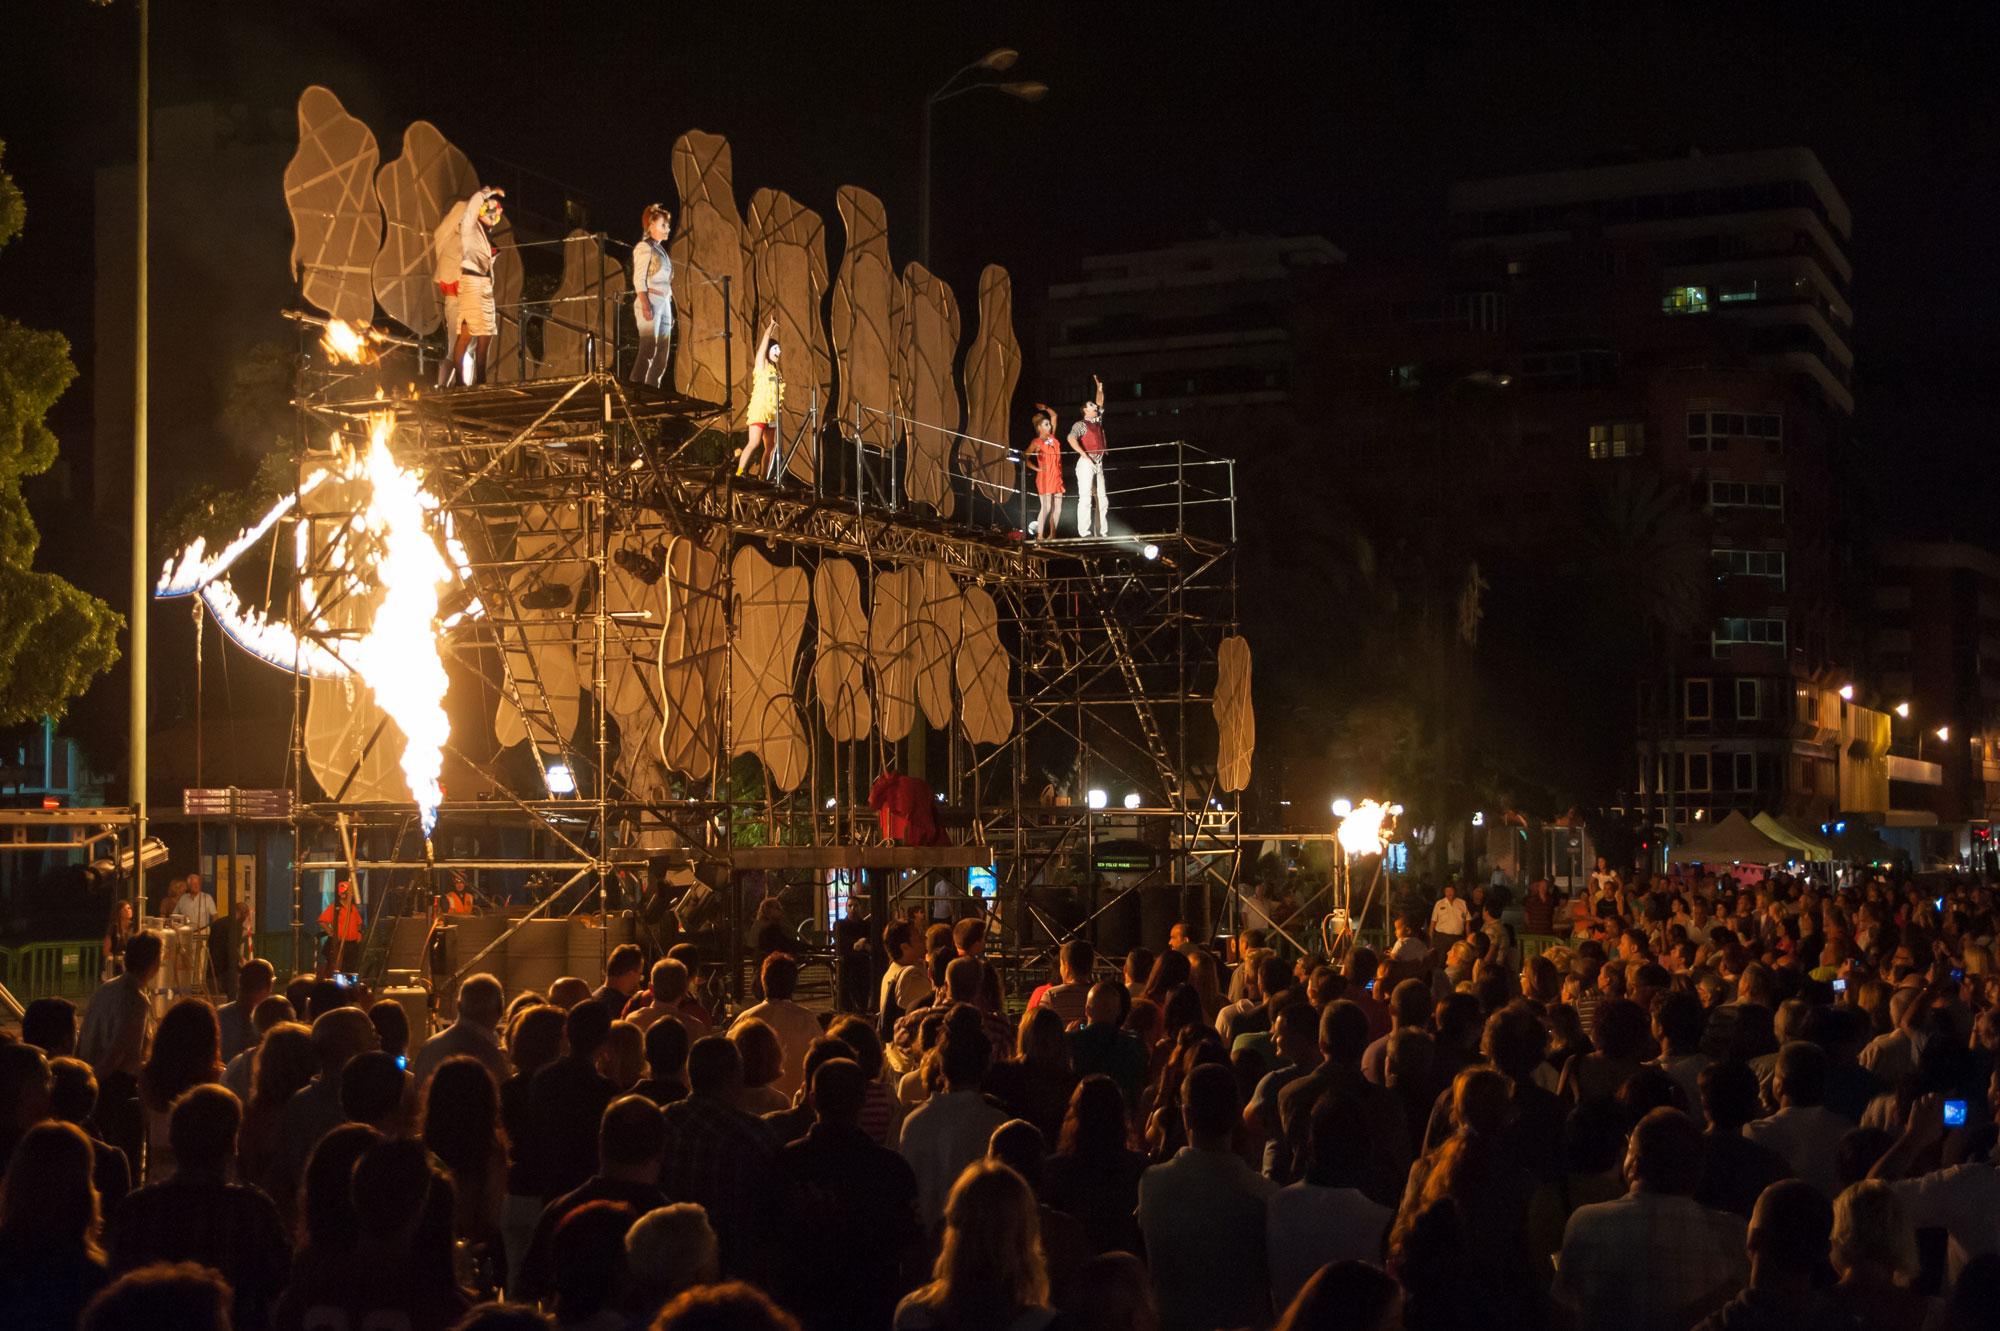 Las Palmas de Gran Canaria, Temudas festival, PAN.OPTIKUM, Transition